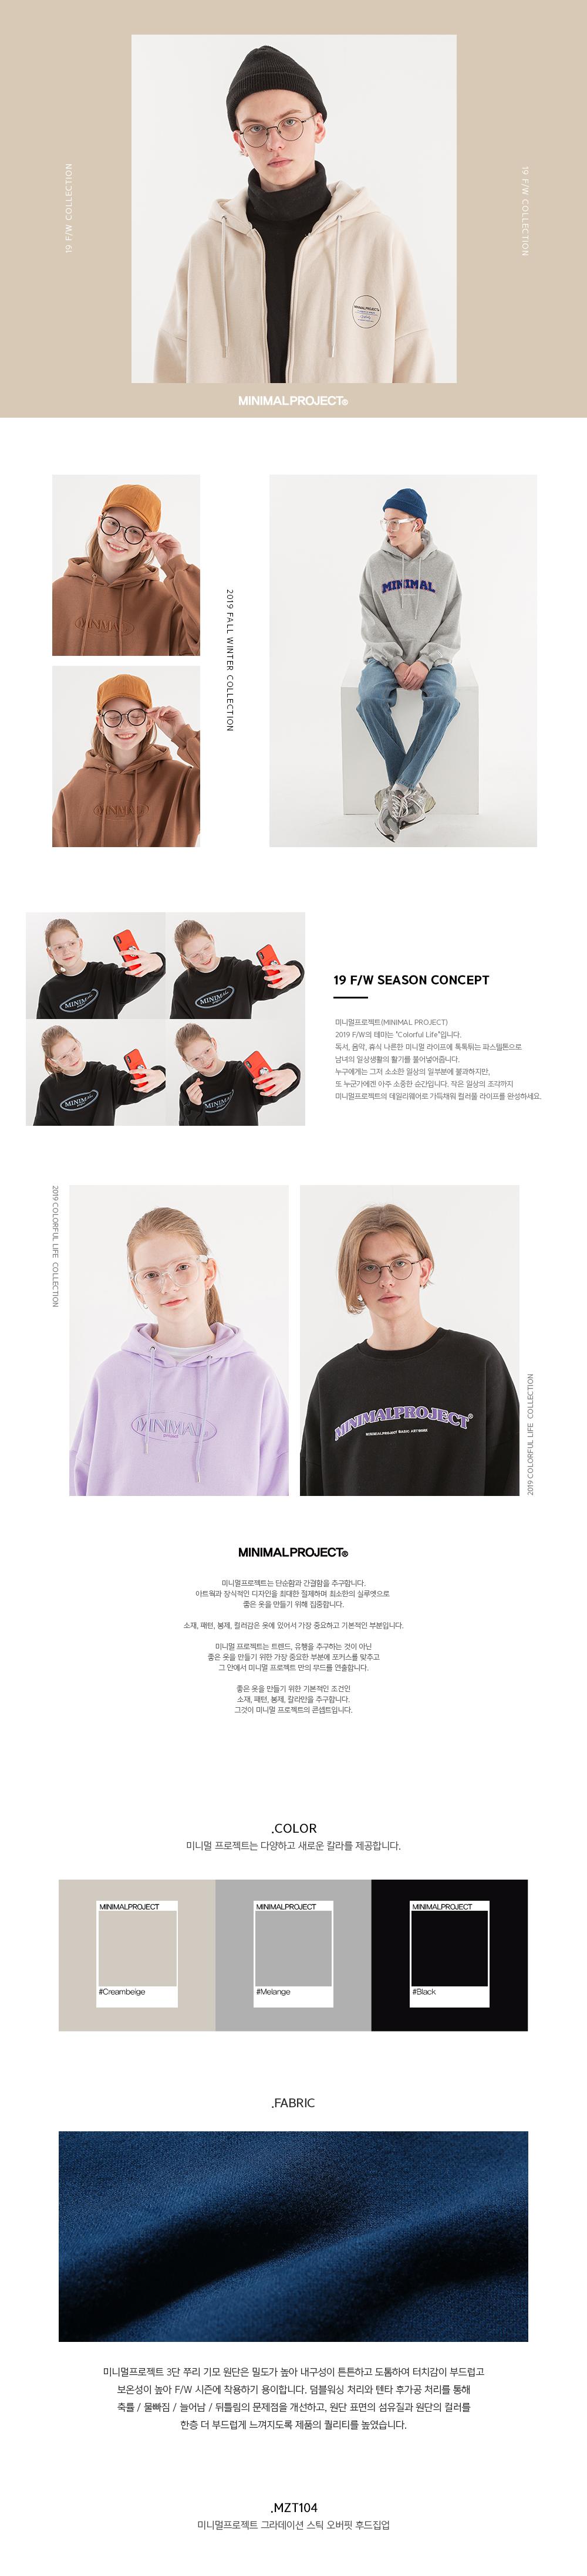 [minimal project] 미니멀프로젝트 그라데이션 스틱 오버핏 후드집업 MZT104 [BLACK]